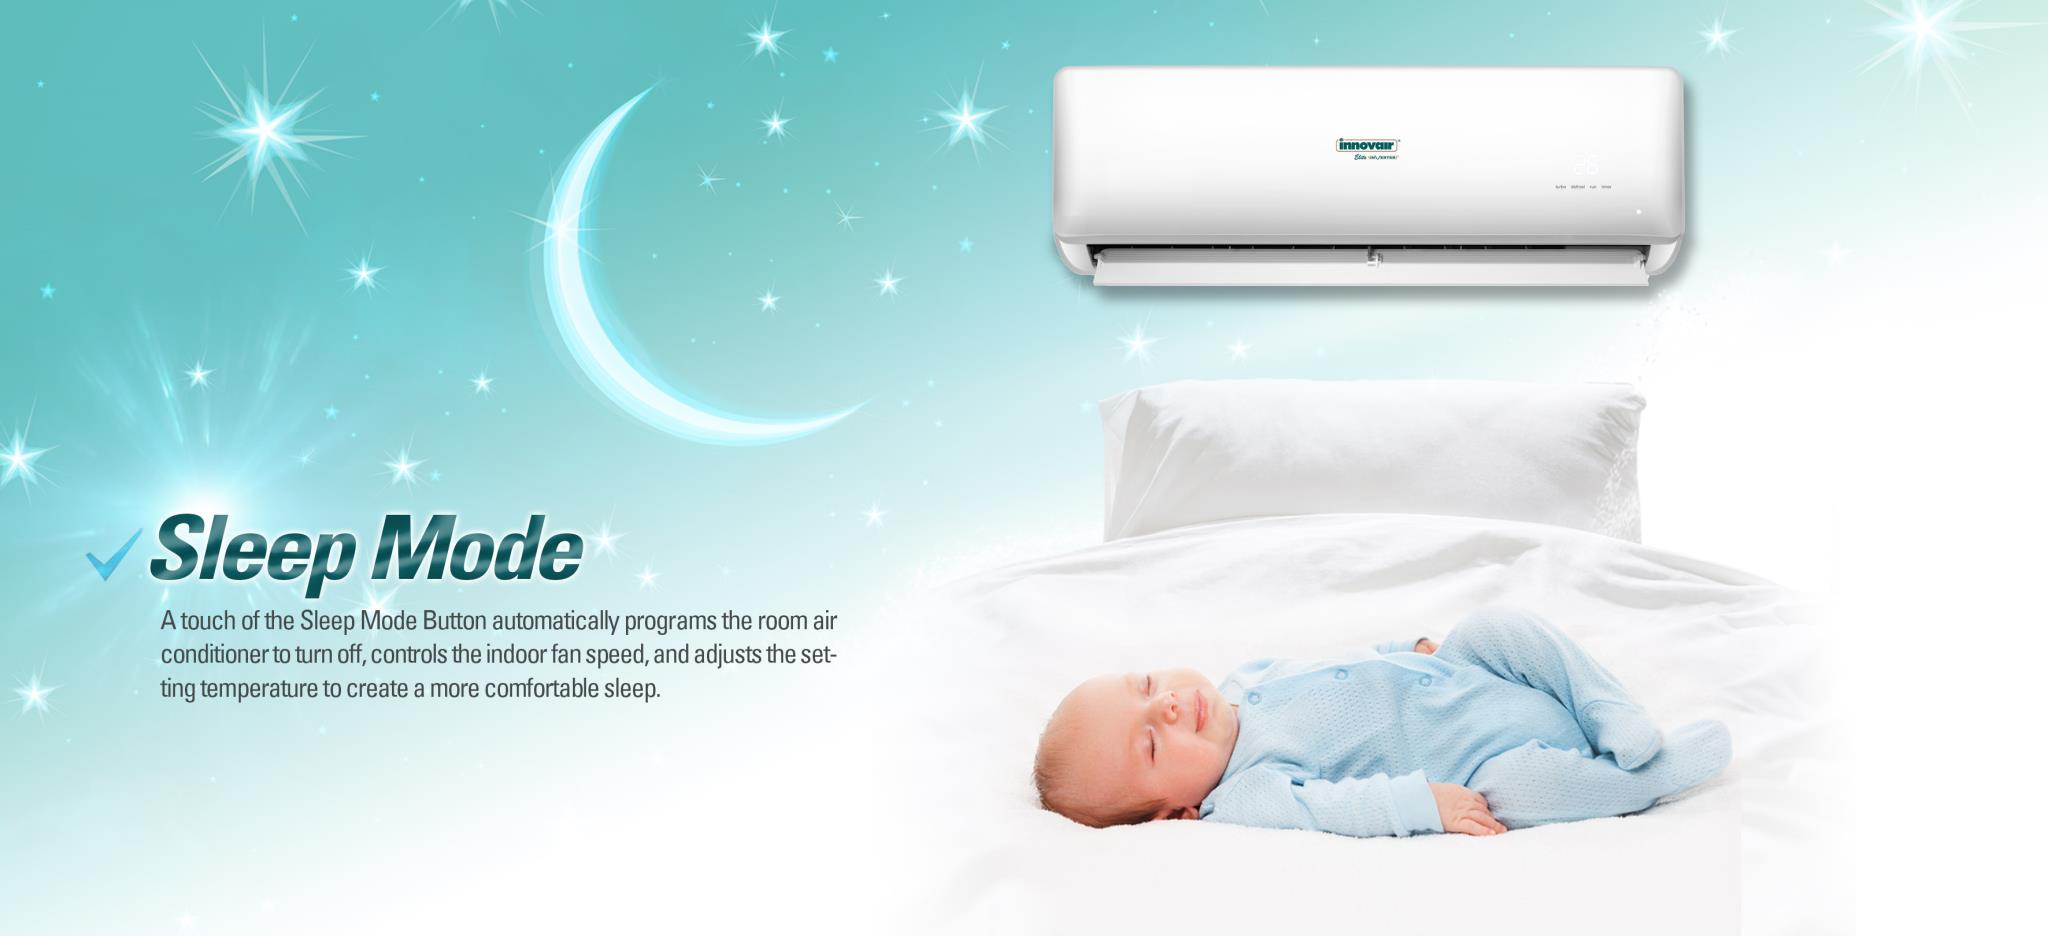 All New Mini Split Ductless Heatpump Systems Innovair